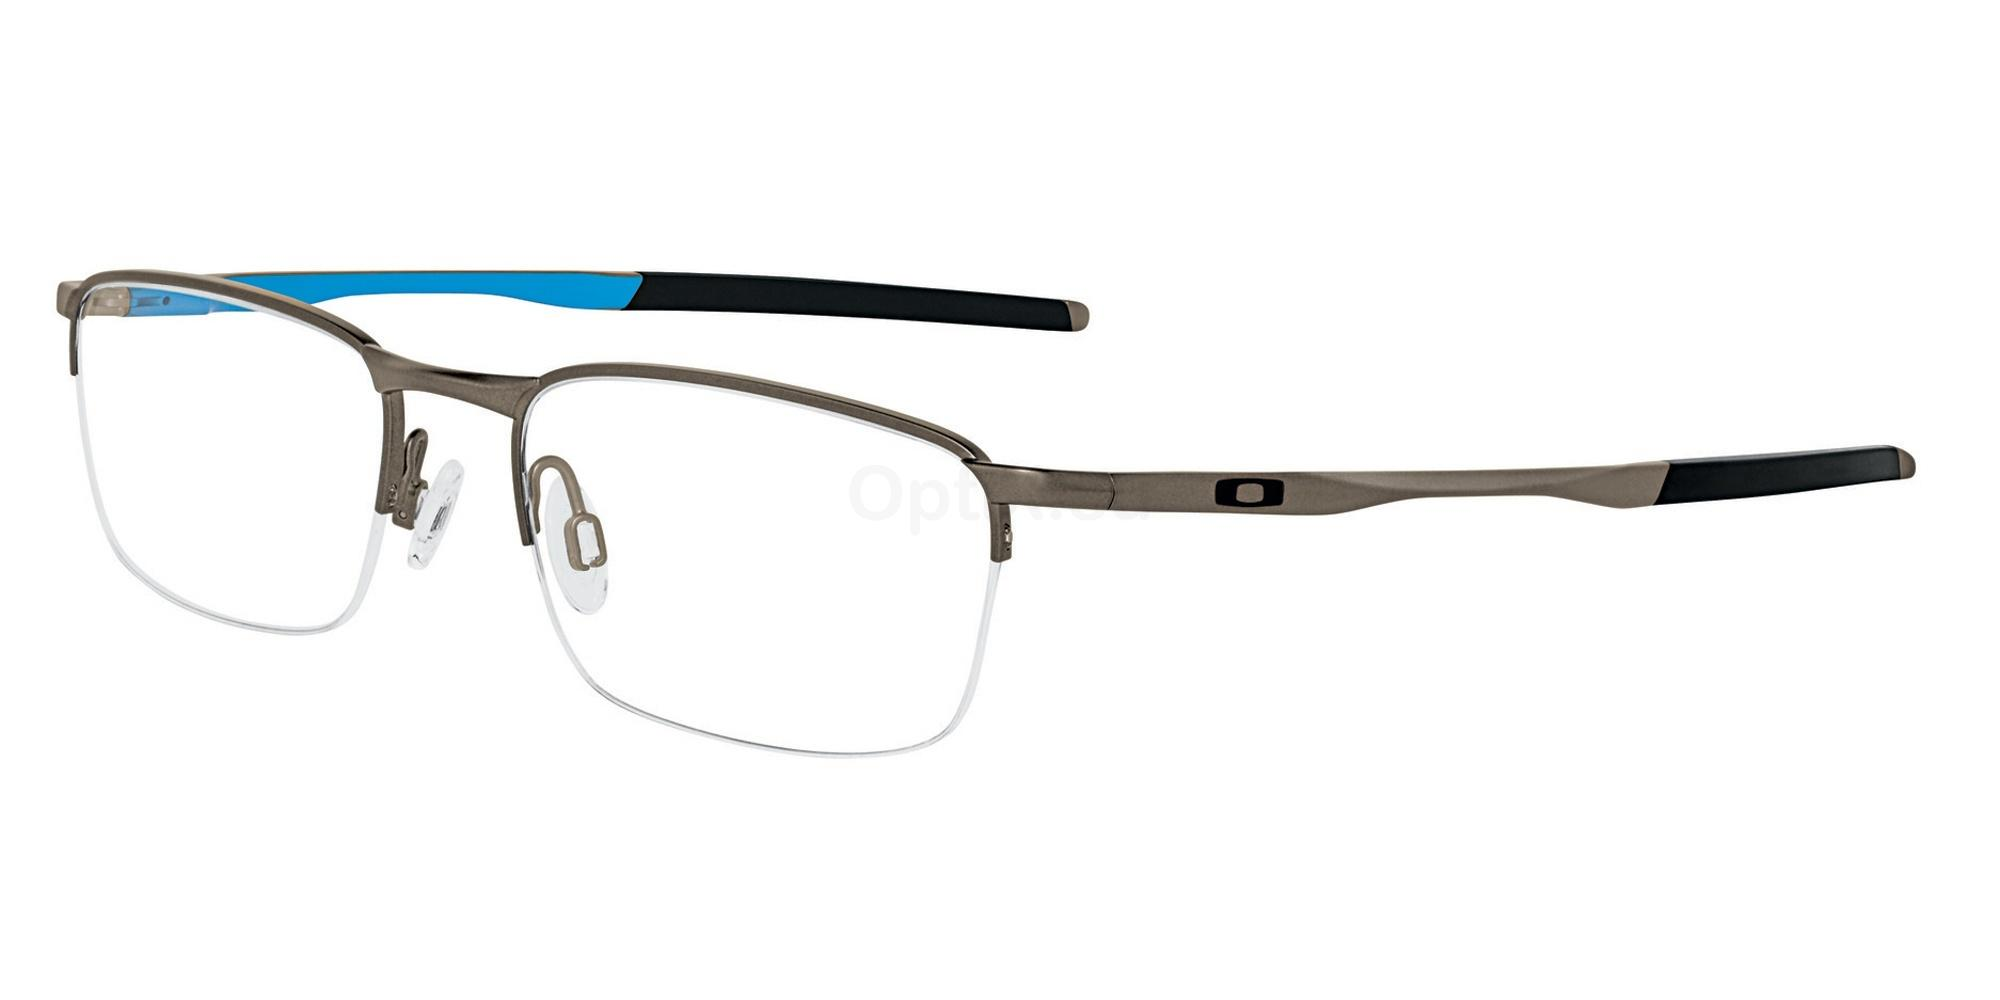 317406 OX3174 BARRELHOUSE 0.5 Glasses, Oakley